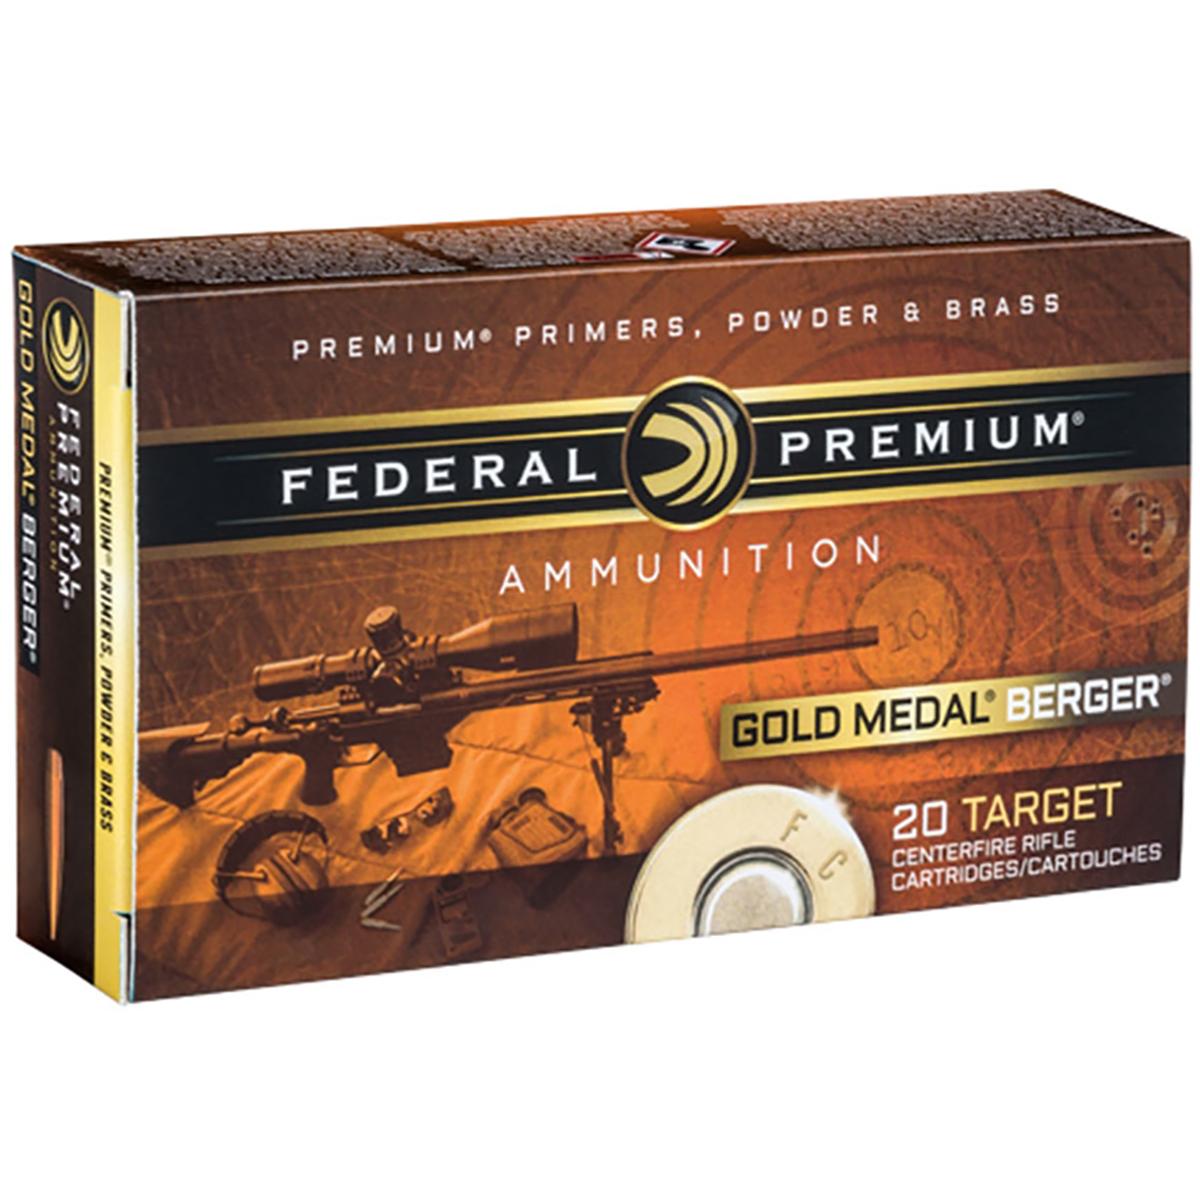 Federal Gold Medal Berger Ammo, 6.5mm Creedmoor, 130-gr., Hybrid OTM